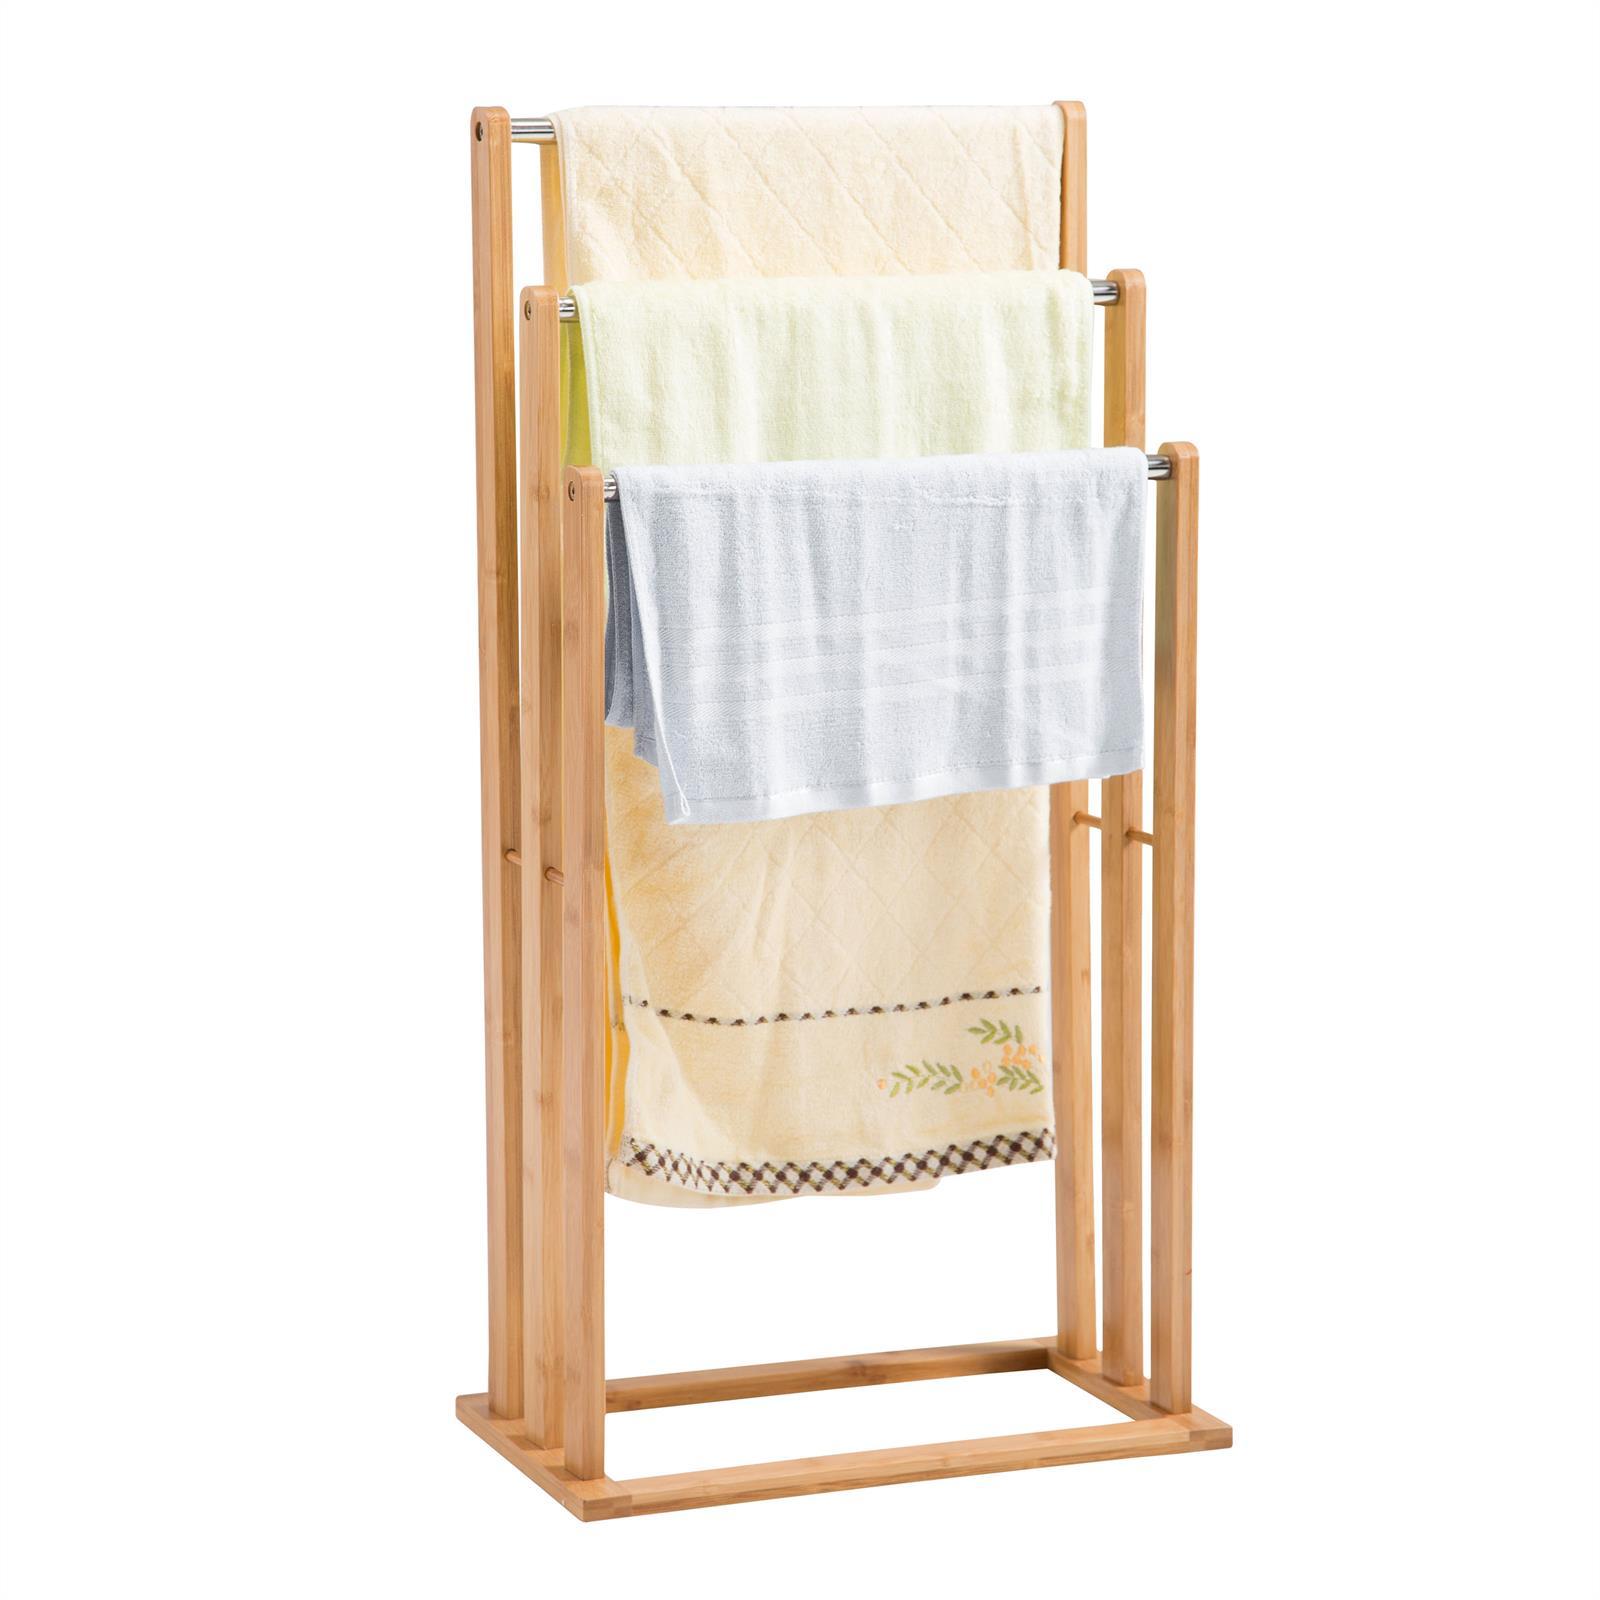 Porte serviettes melton en bambou finition naturelle mobil meubles - Set salle de bain bambou ...